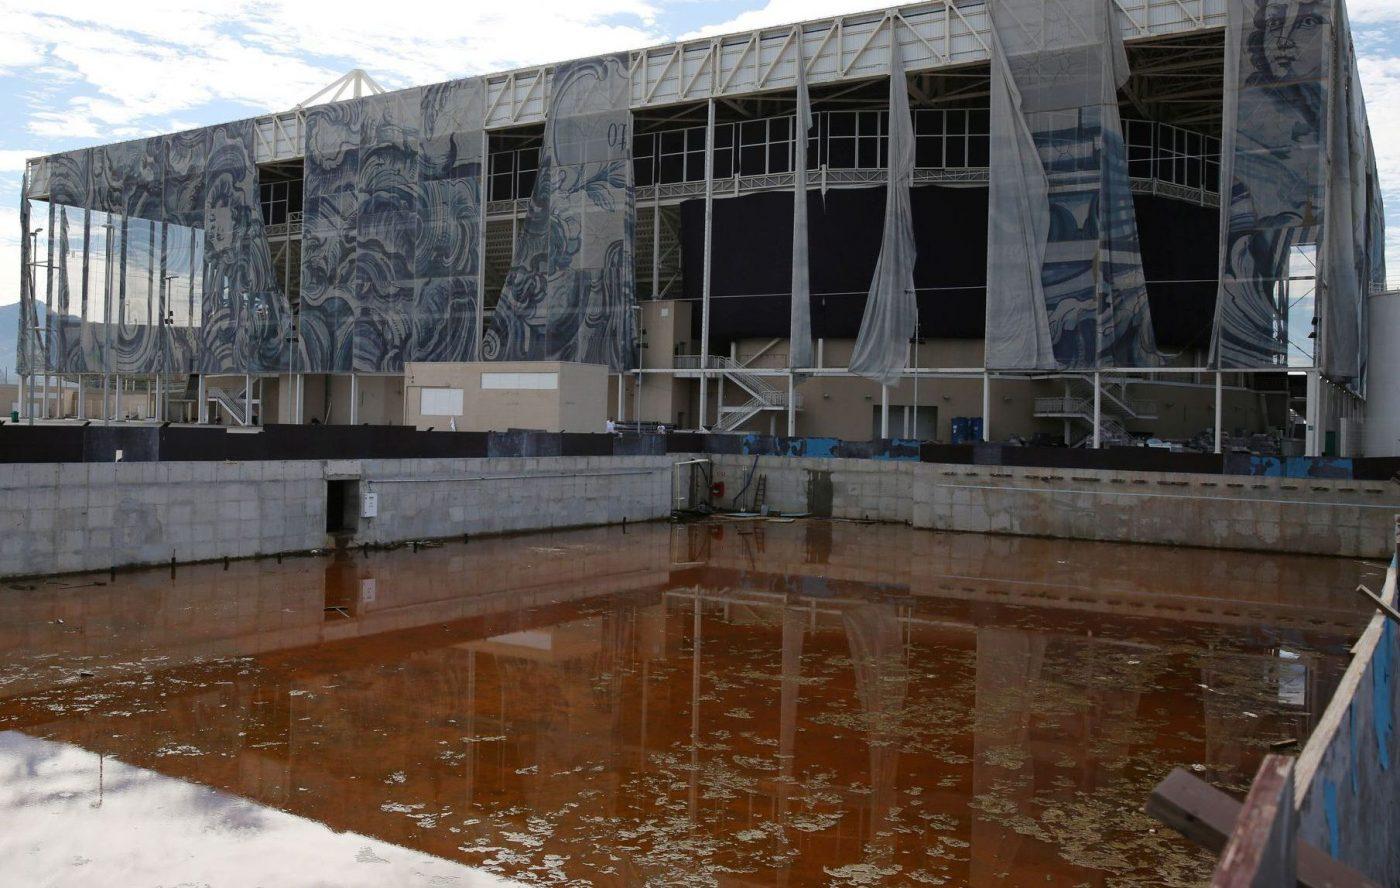 Bassin entrainement Rio 2016